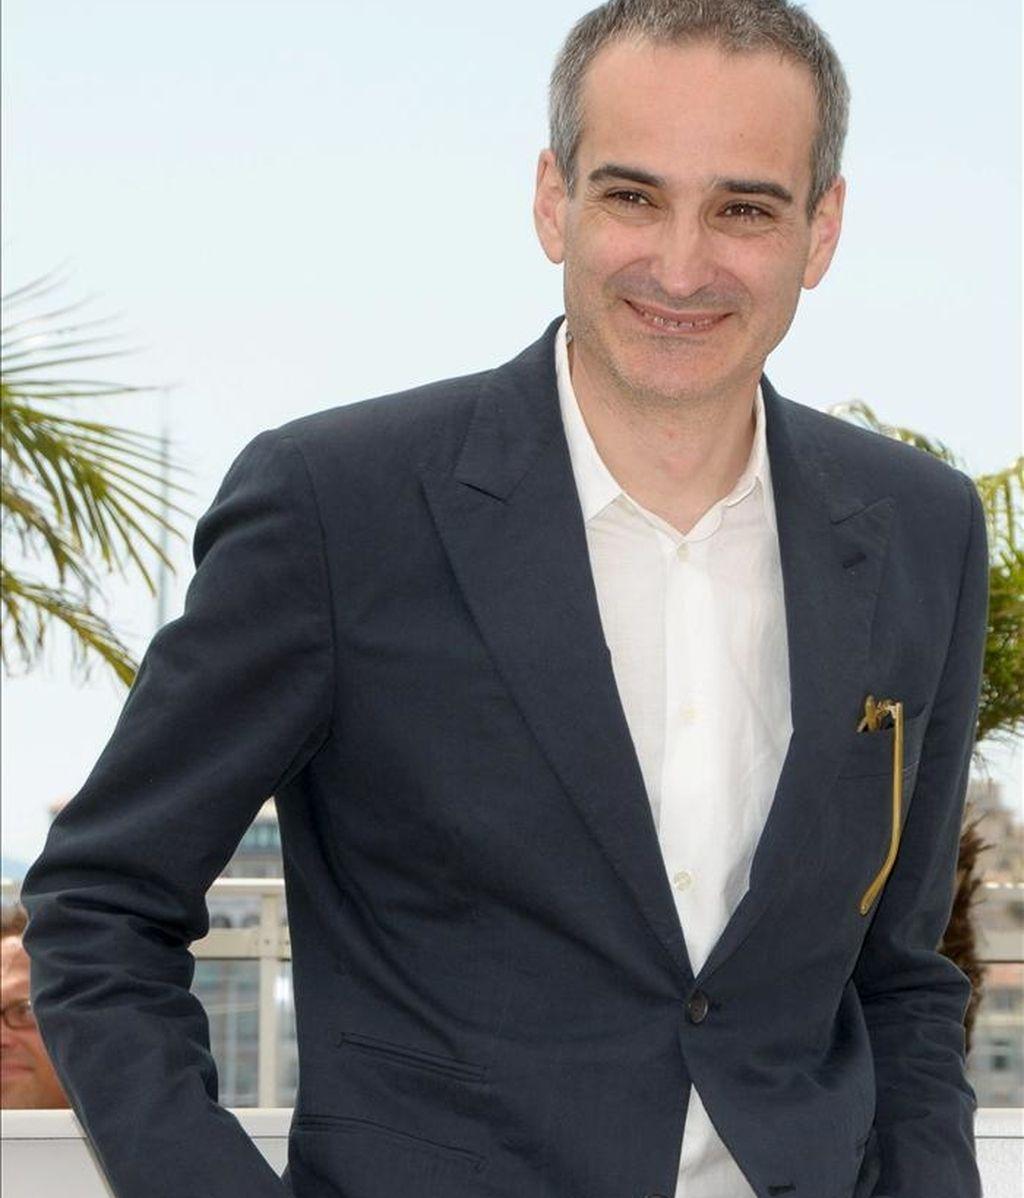 El director francés Olivier Assayas. EFE/Archivo